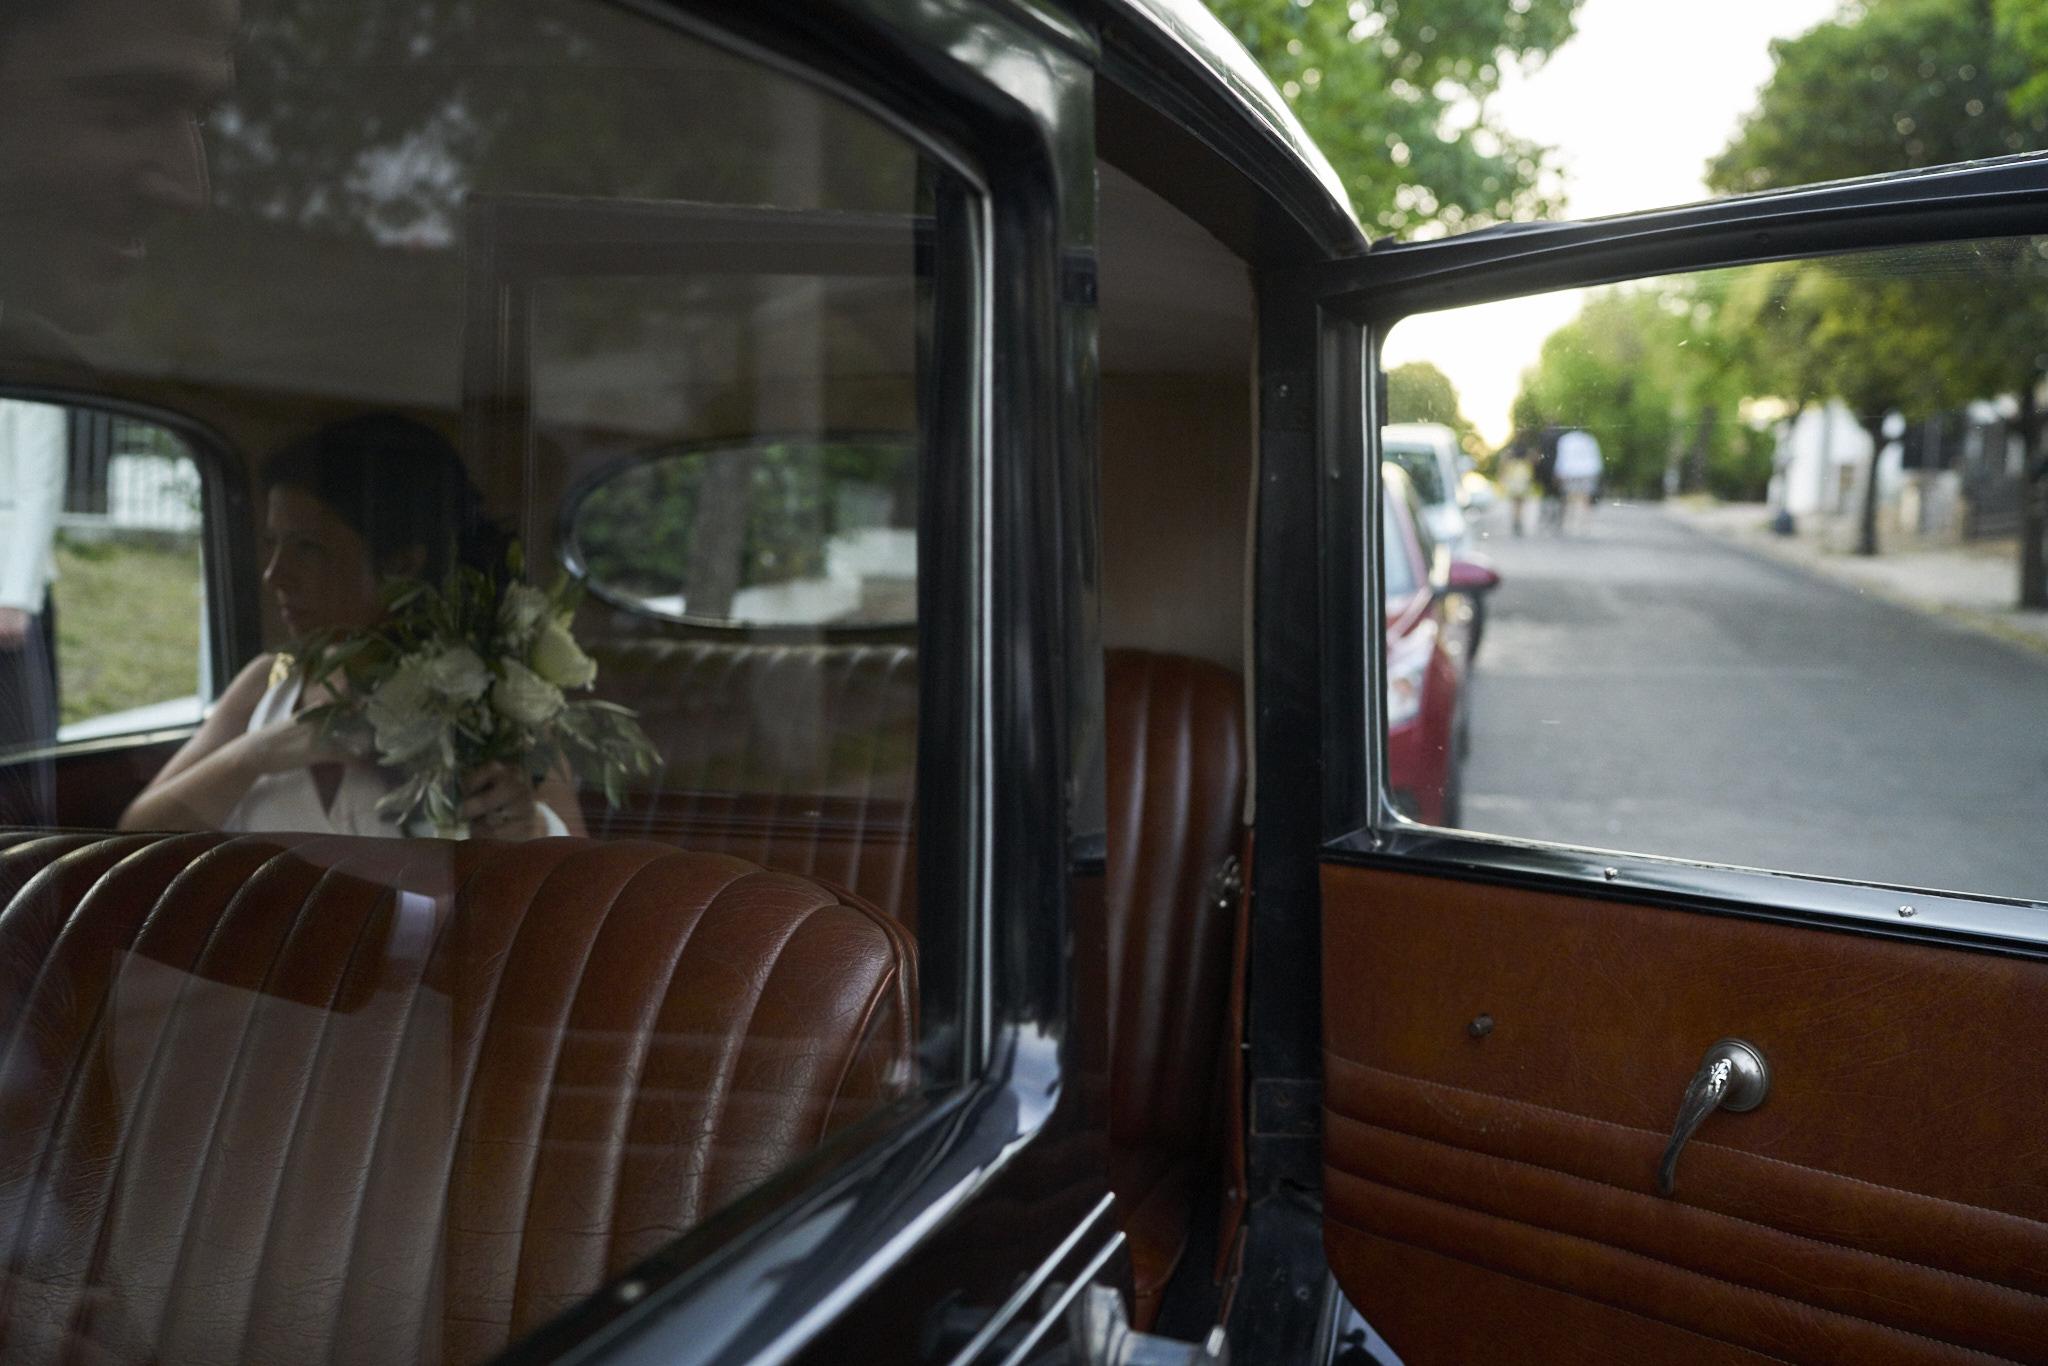 12 Fotografo de Casamientos - Bodas en Tucson - Cordoba DSC06671.jpg